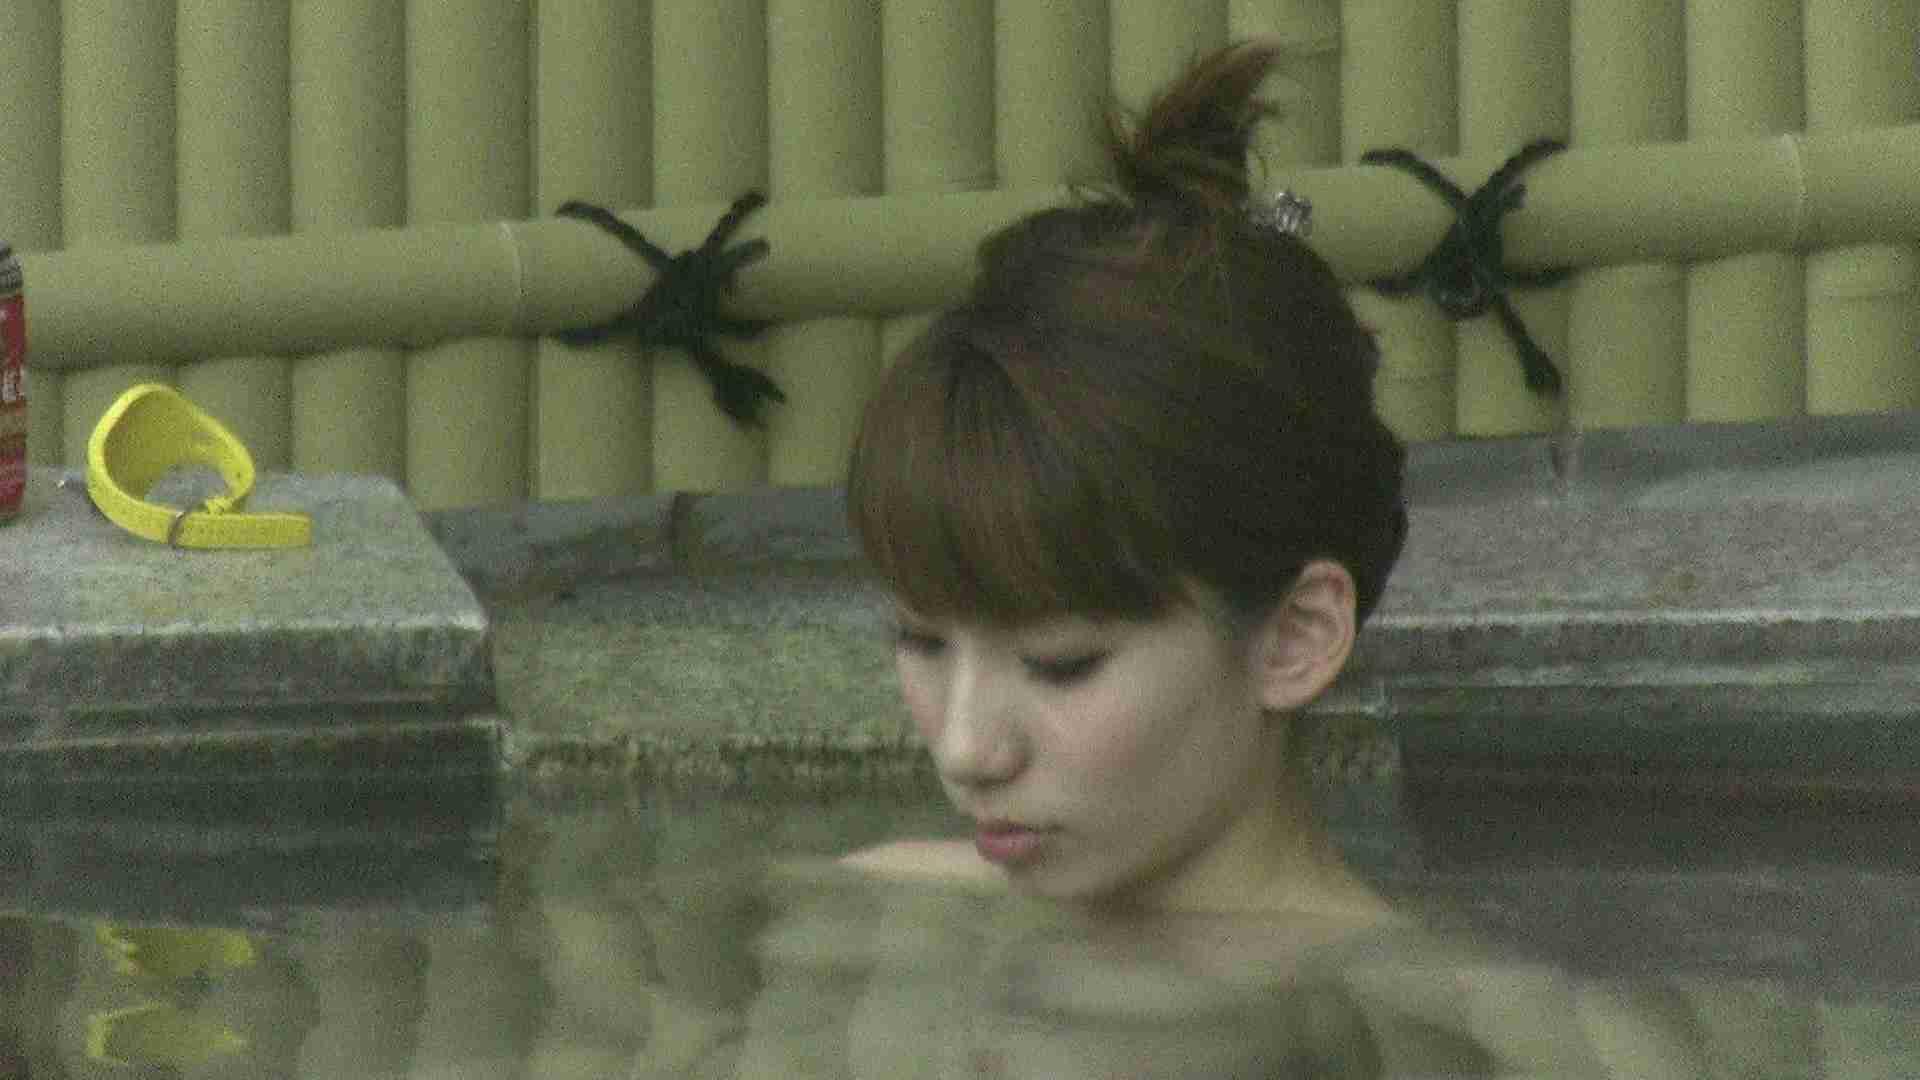 Aquaな露天風呂Vol.208 露天風呂編  103PIX 34